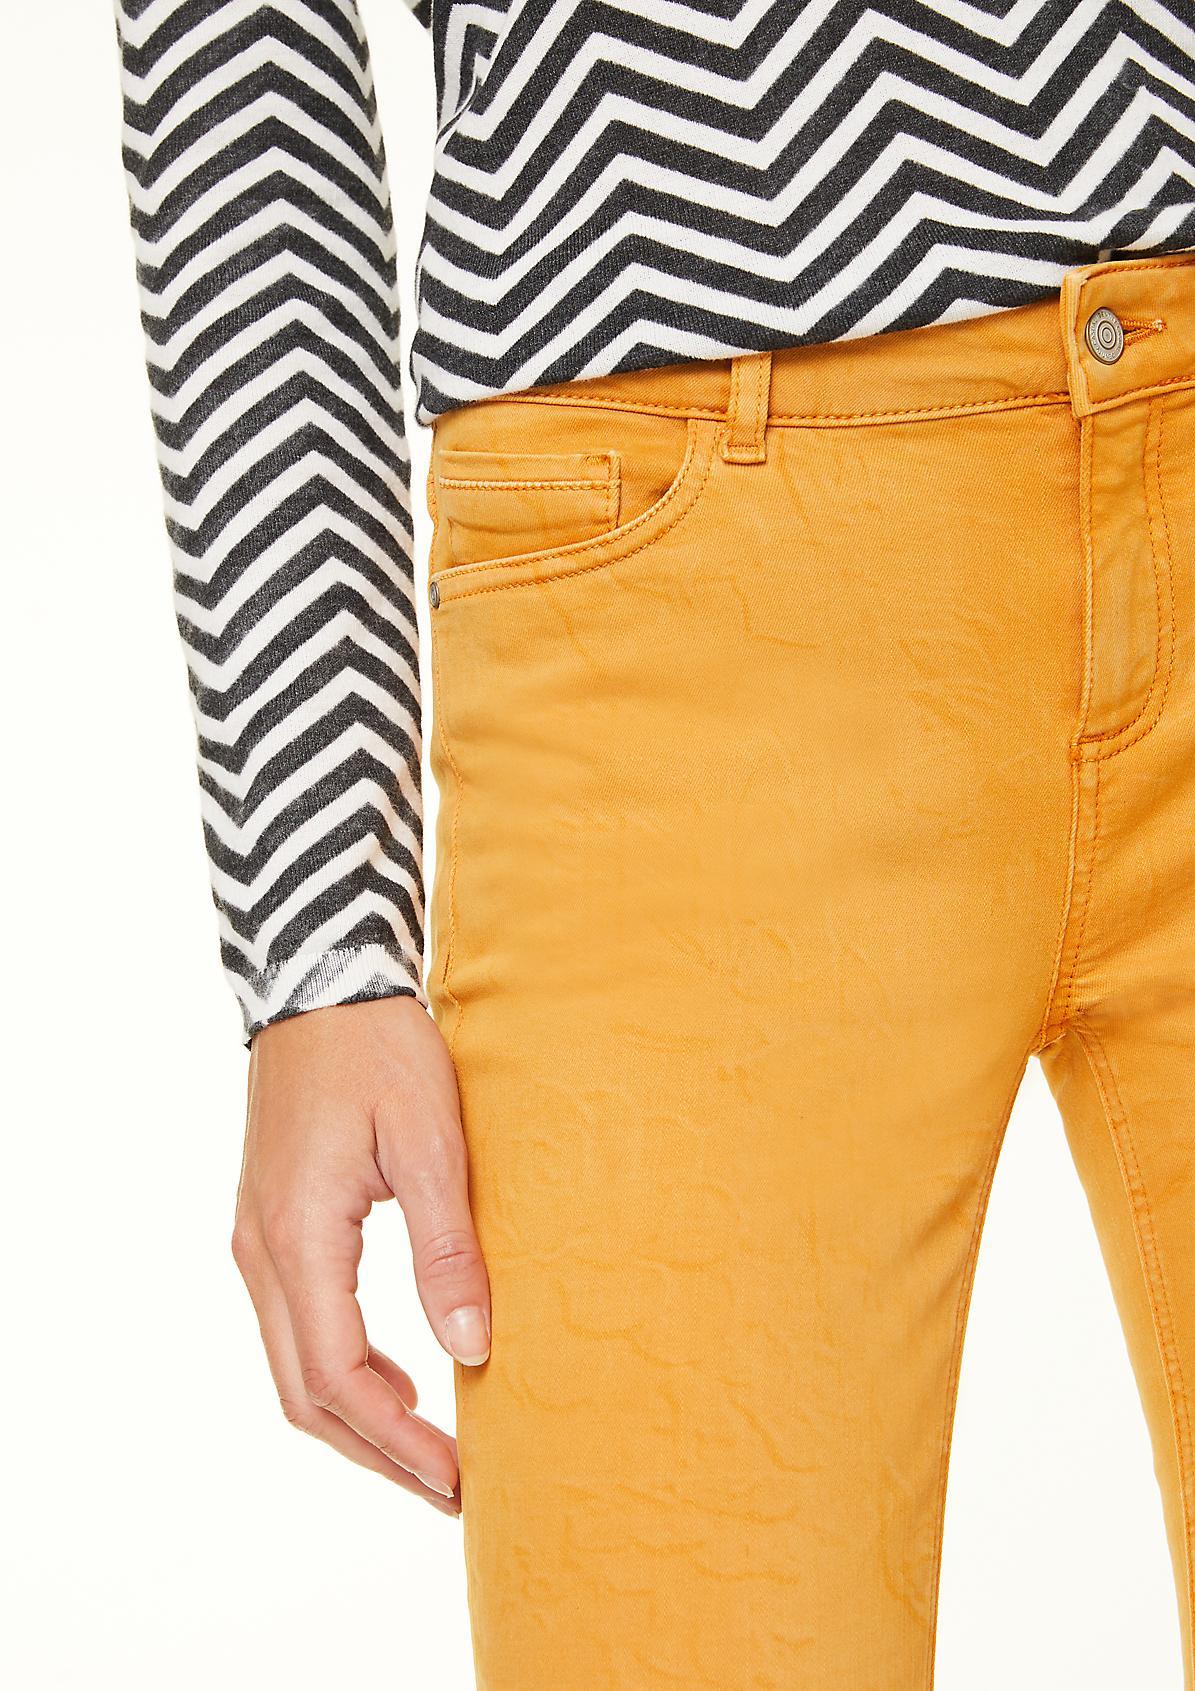 Skinny Fit: Jeans mit Statement-Wording